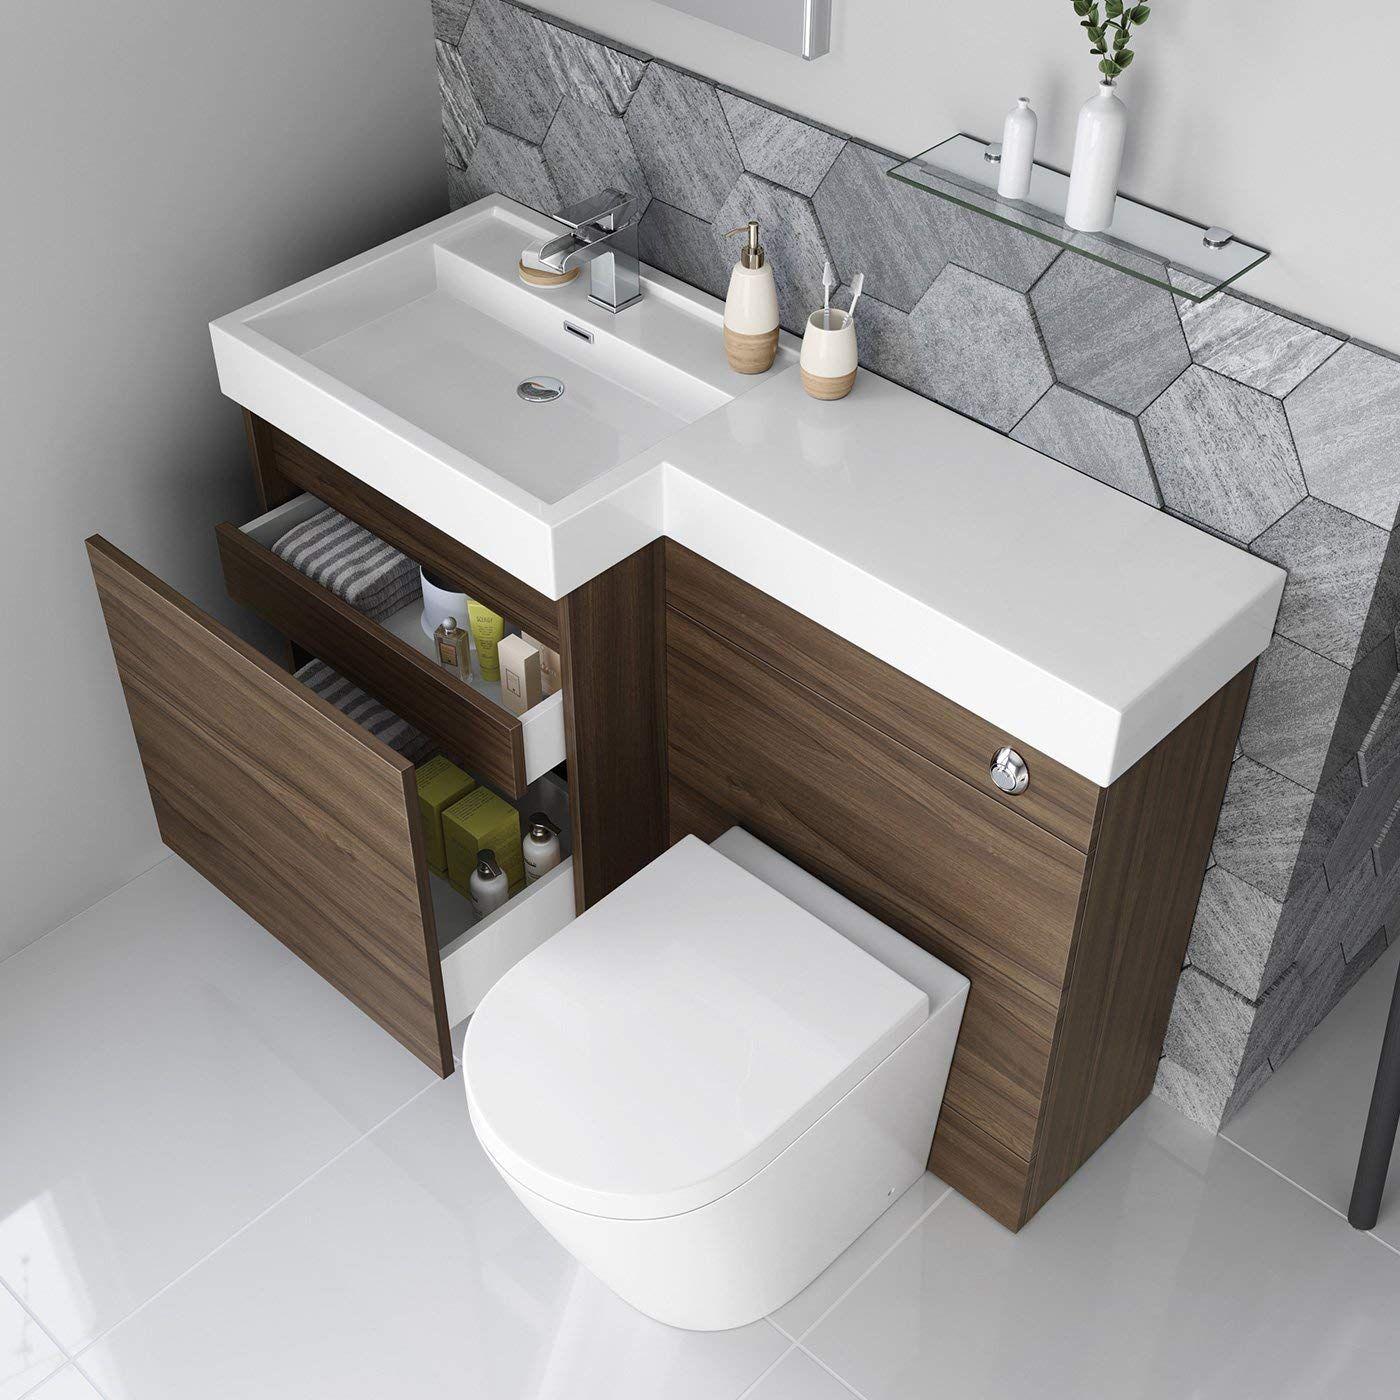 1200mm Walnut Vanity Unit Round Toilet Bathroom Sink Left Hand